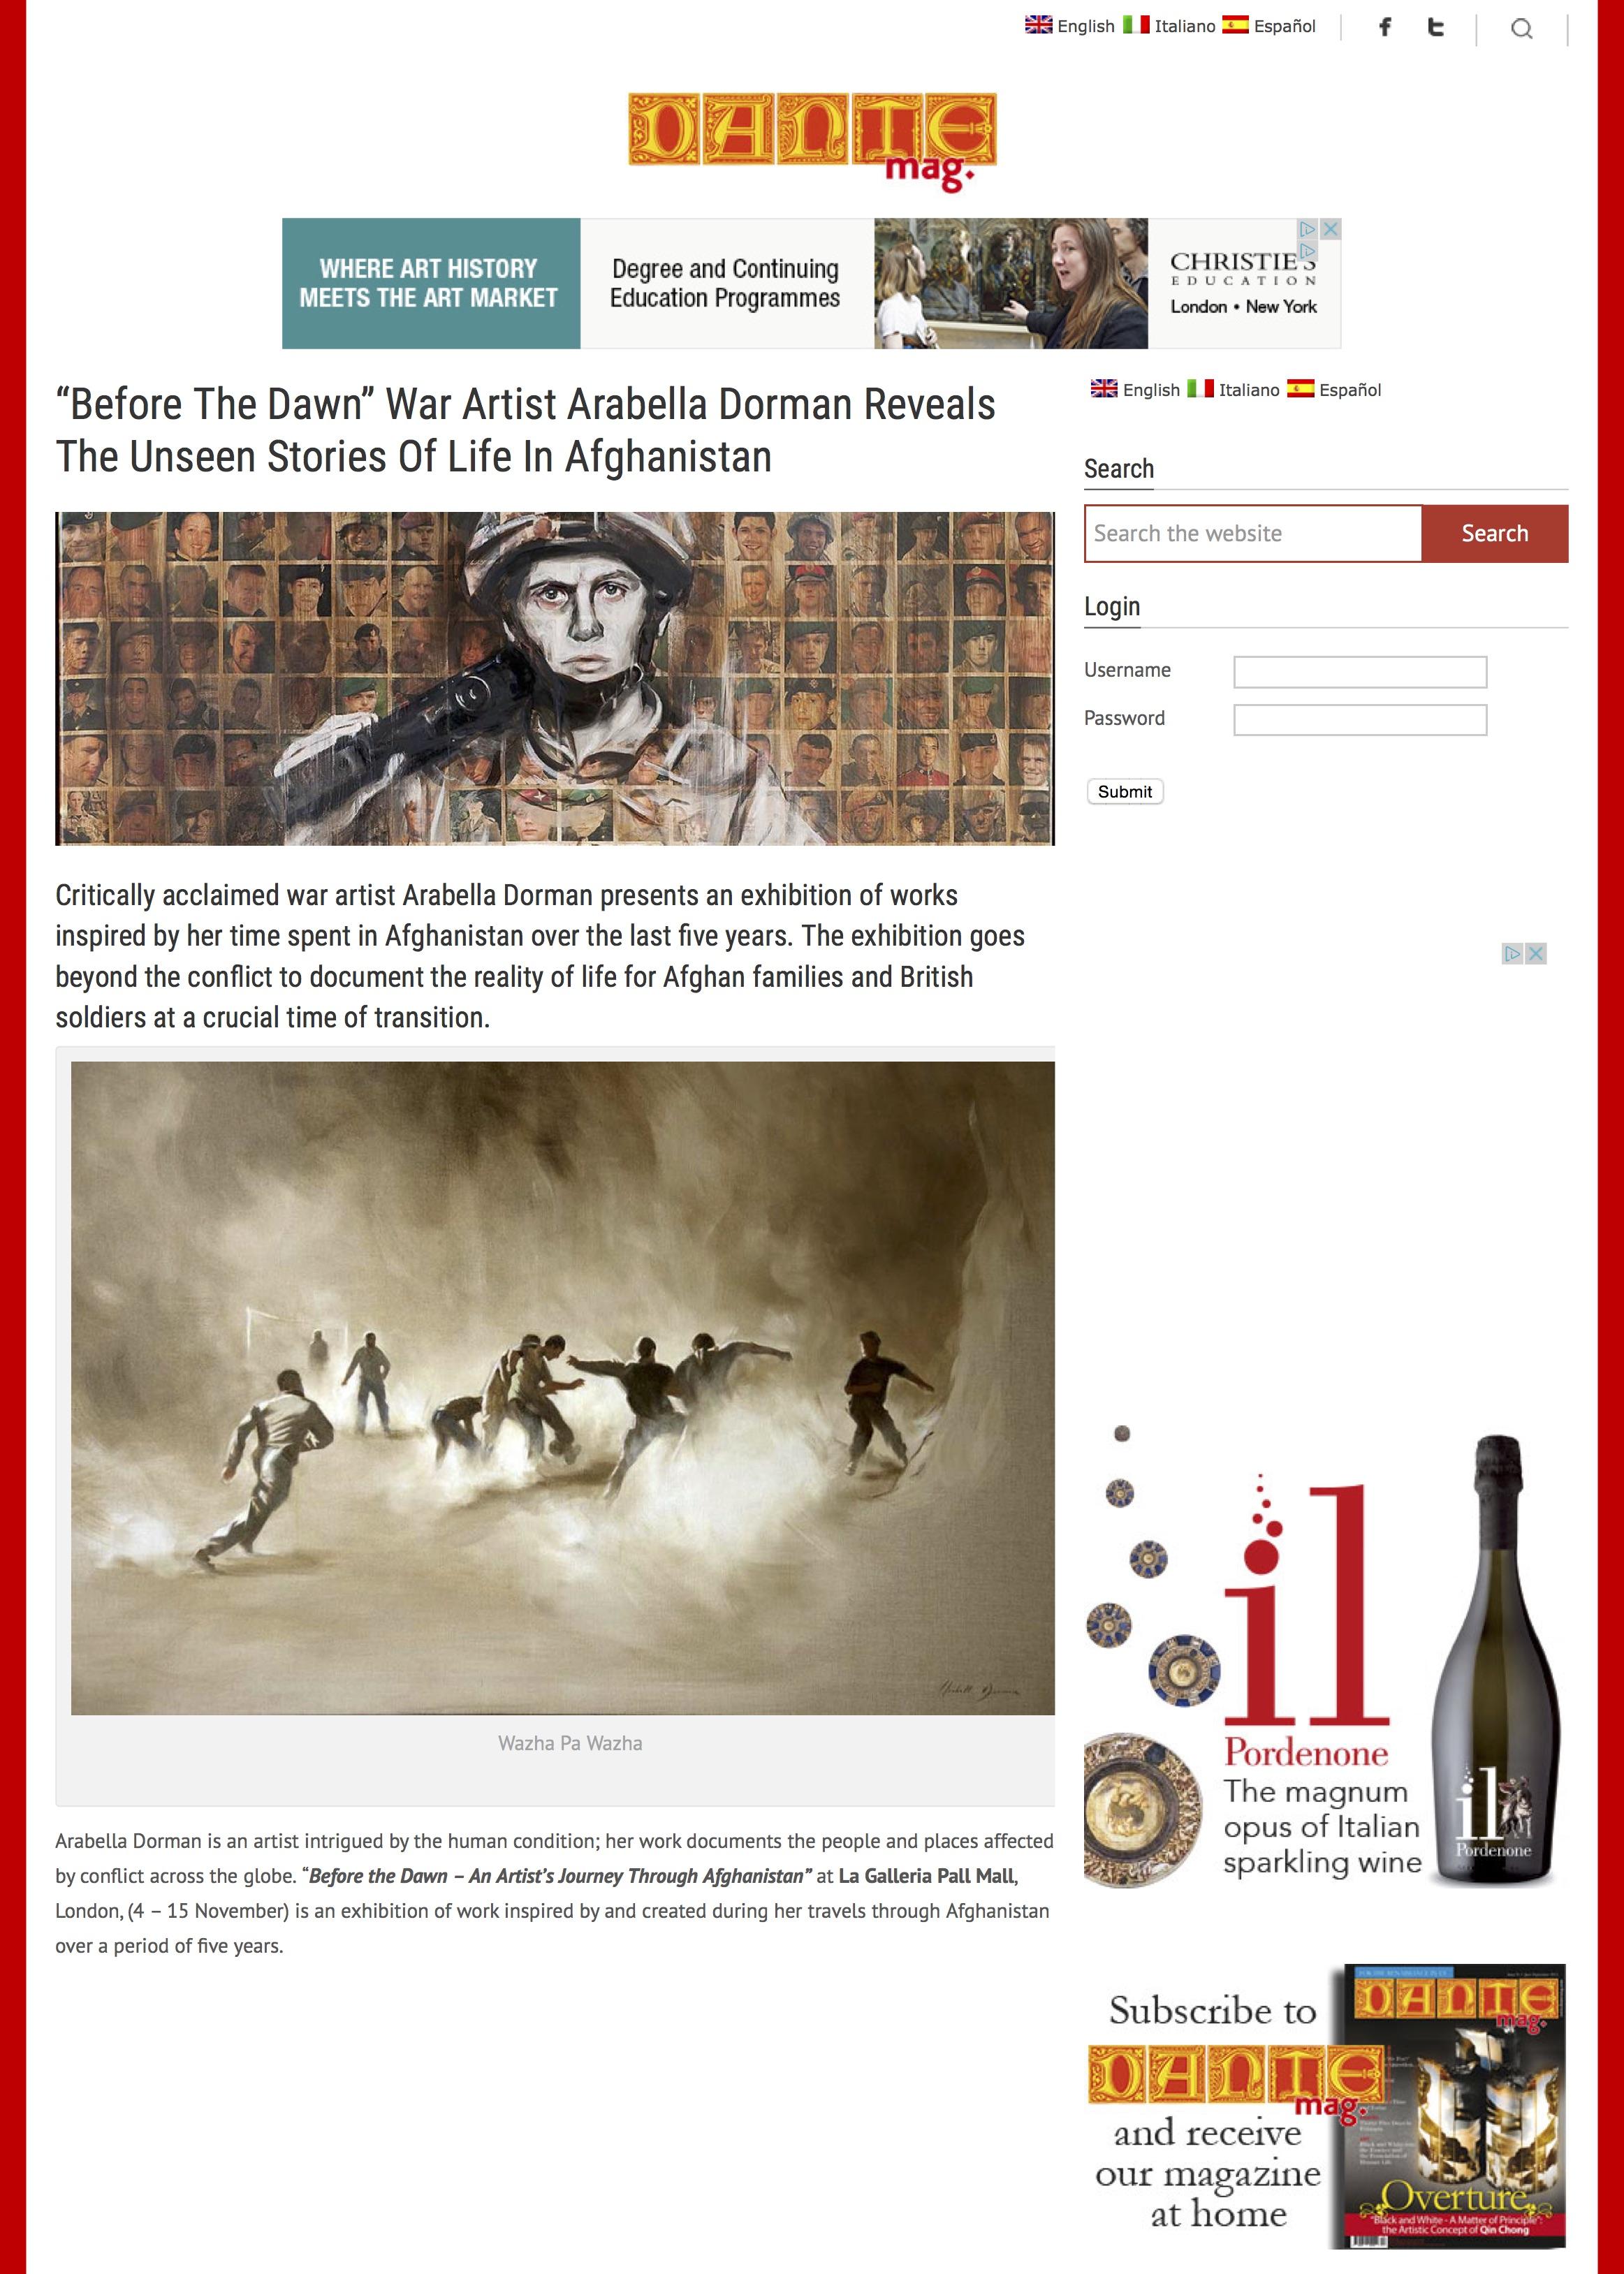 """Before The Dawn"" War Artist Arabella Dorman Reveals The Unseen Stories Of Life In Afghanistan | DAN.jpg"